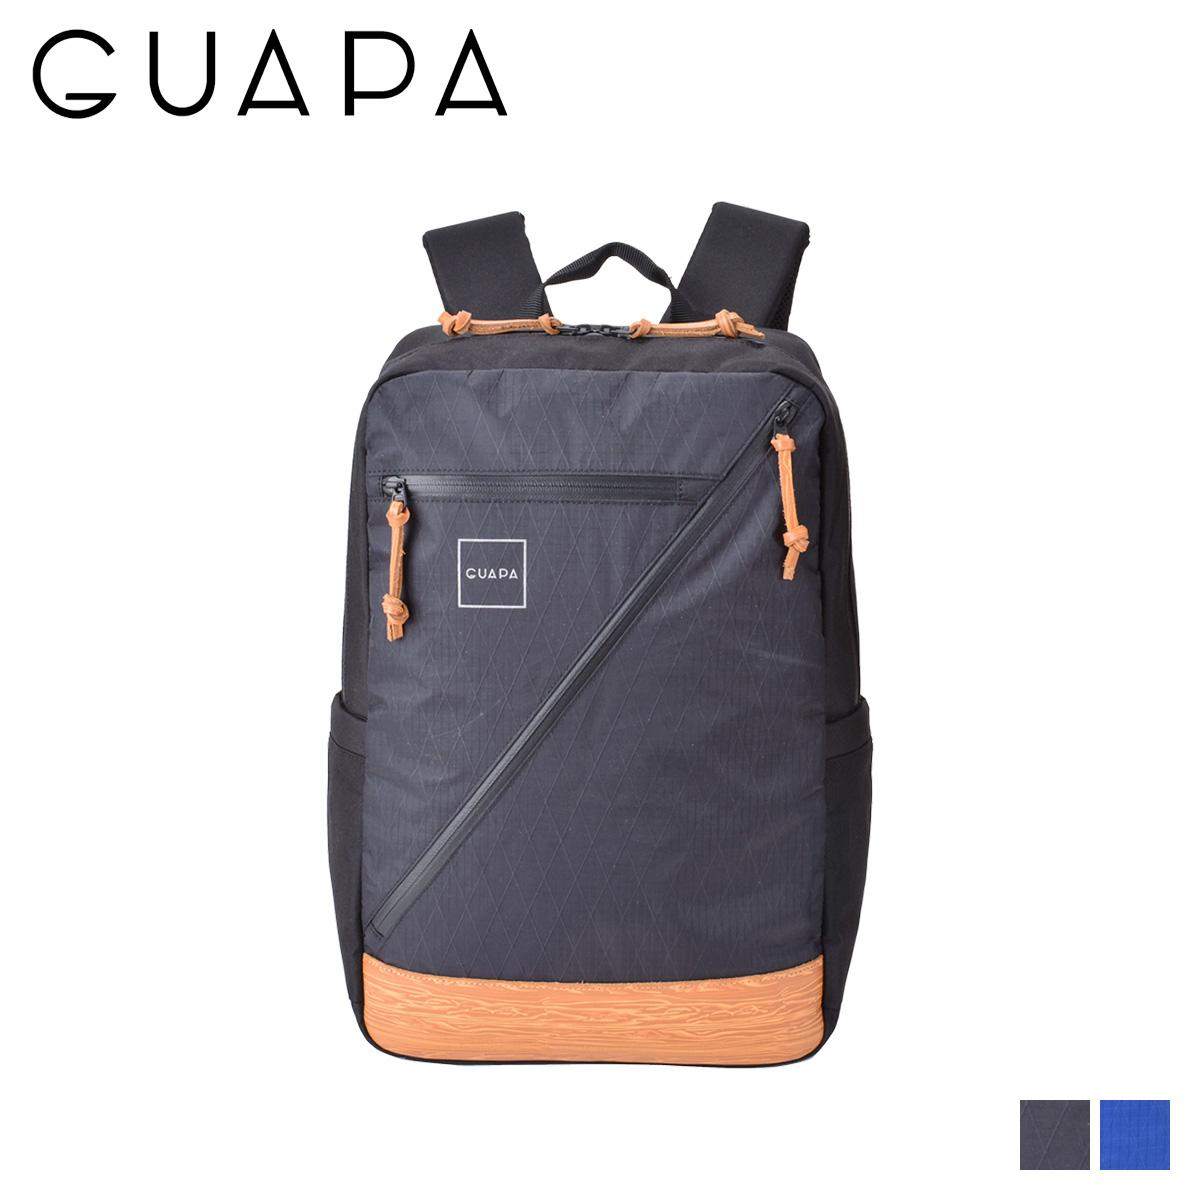 GUAPA X SERIES グアパ リュック バッグ バックパック メンズ レディース 18L ブラック ネイビー 黒 51000